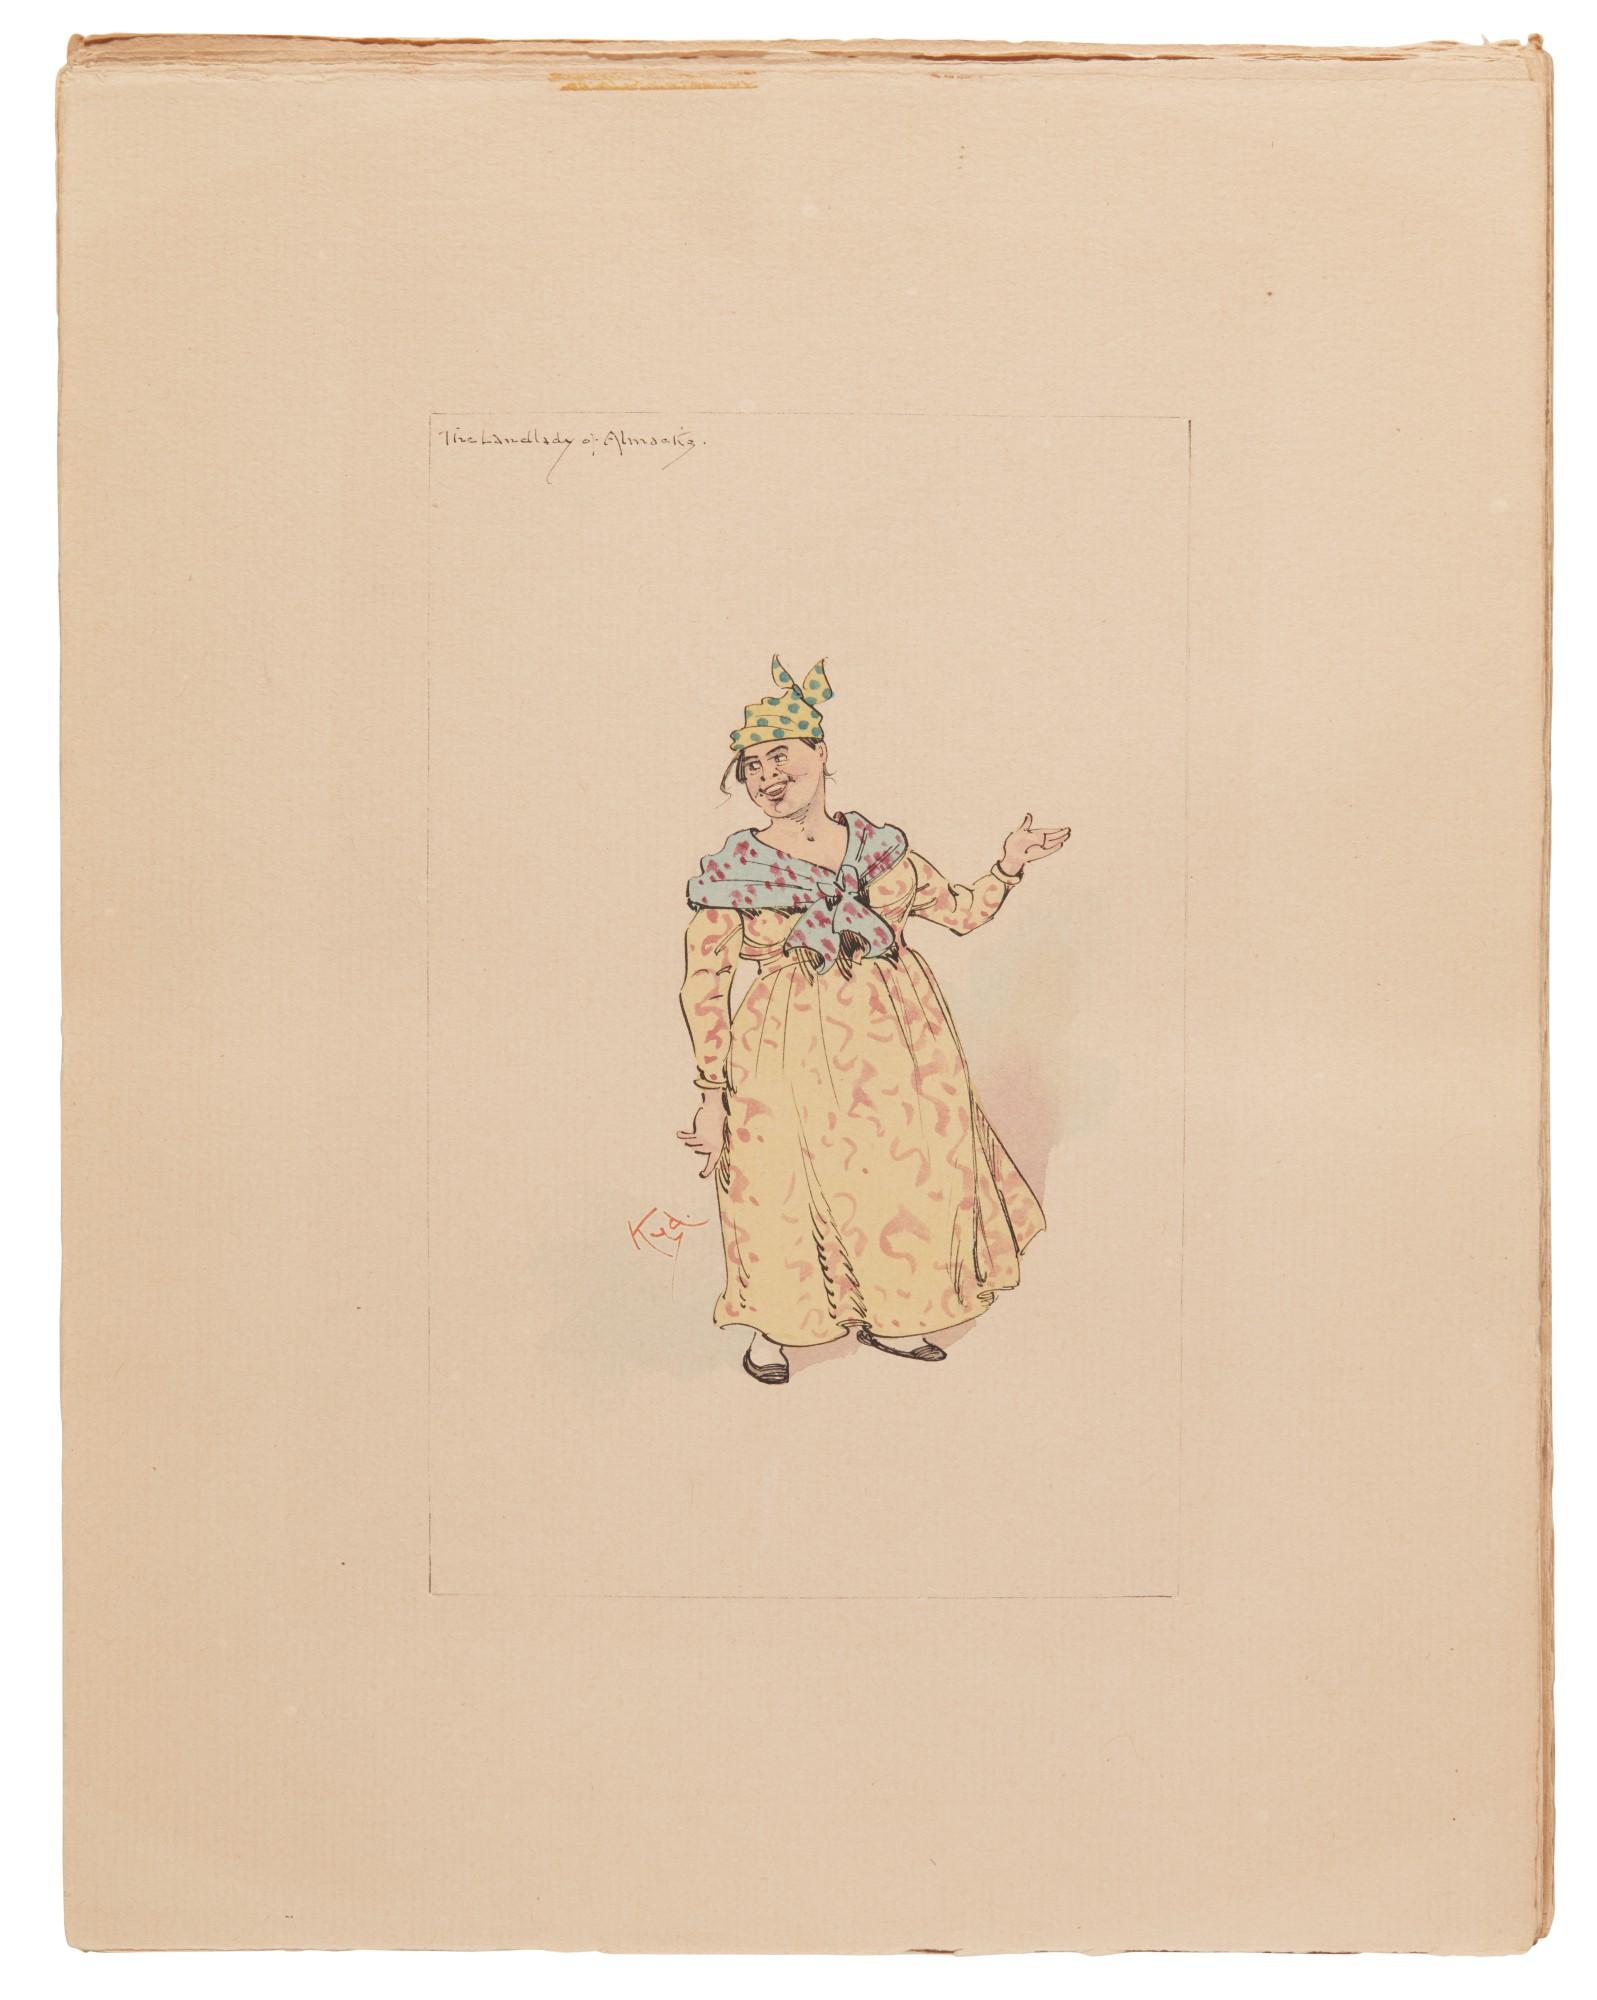 Clarke, 24 original illustrations to American Notes, [c.1920s]